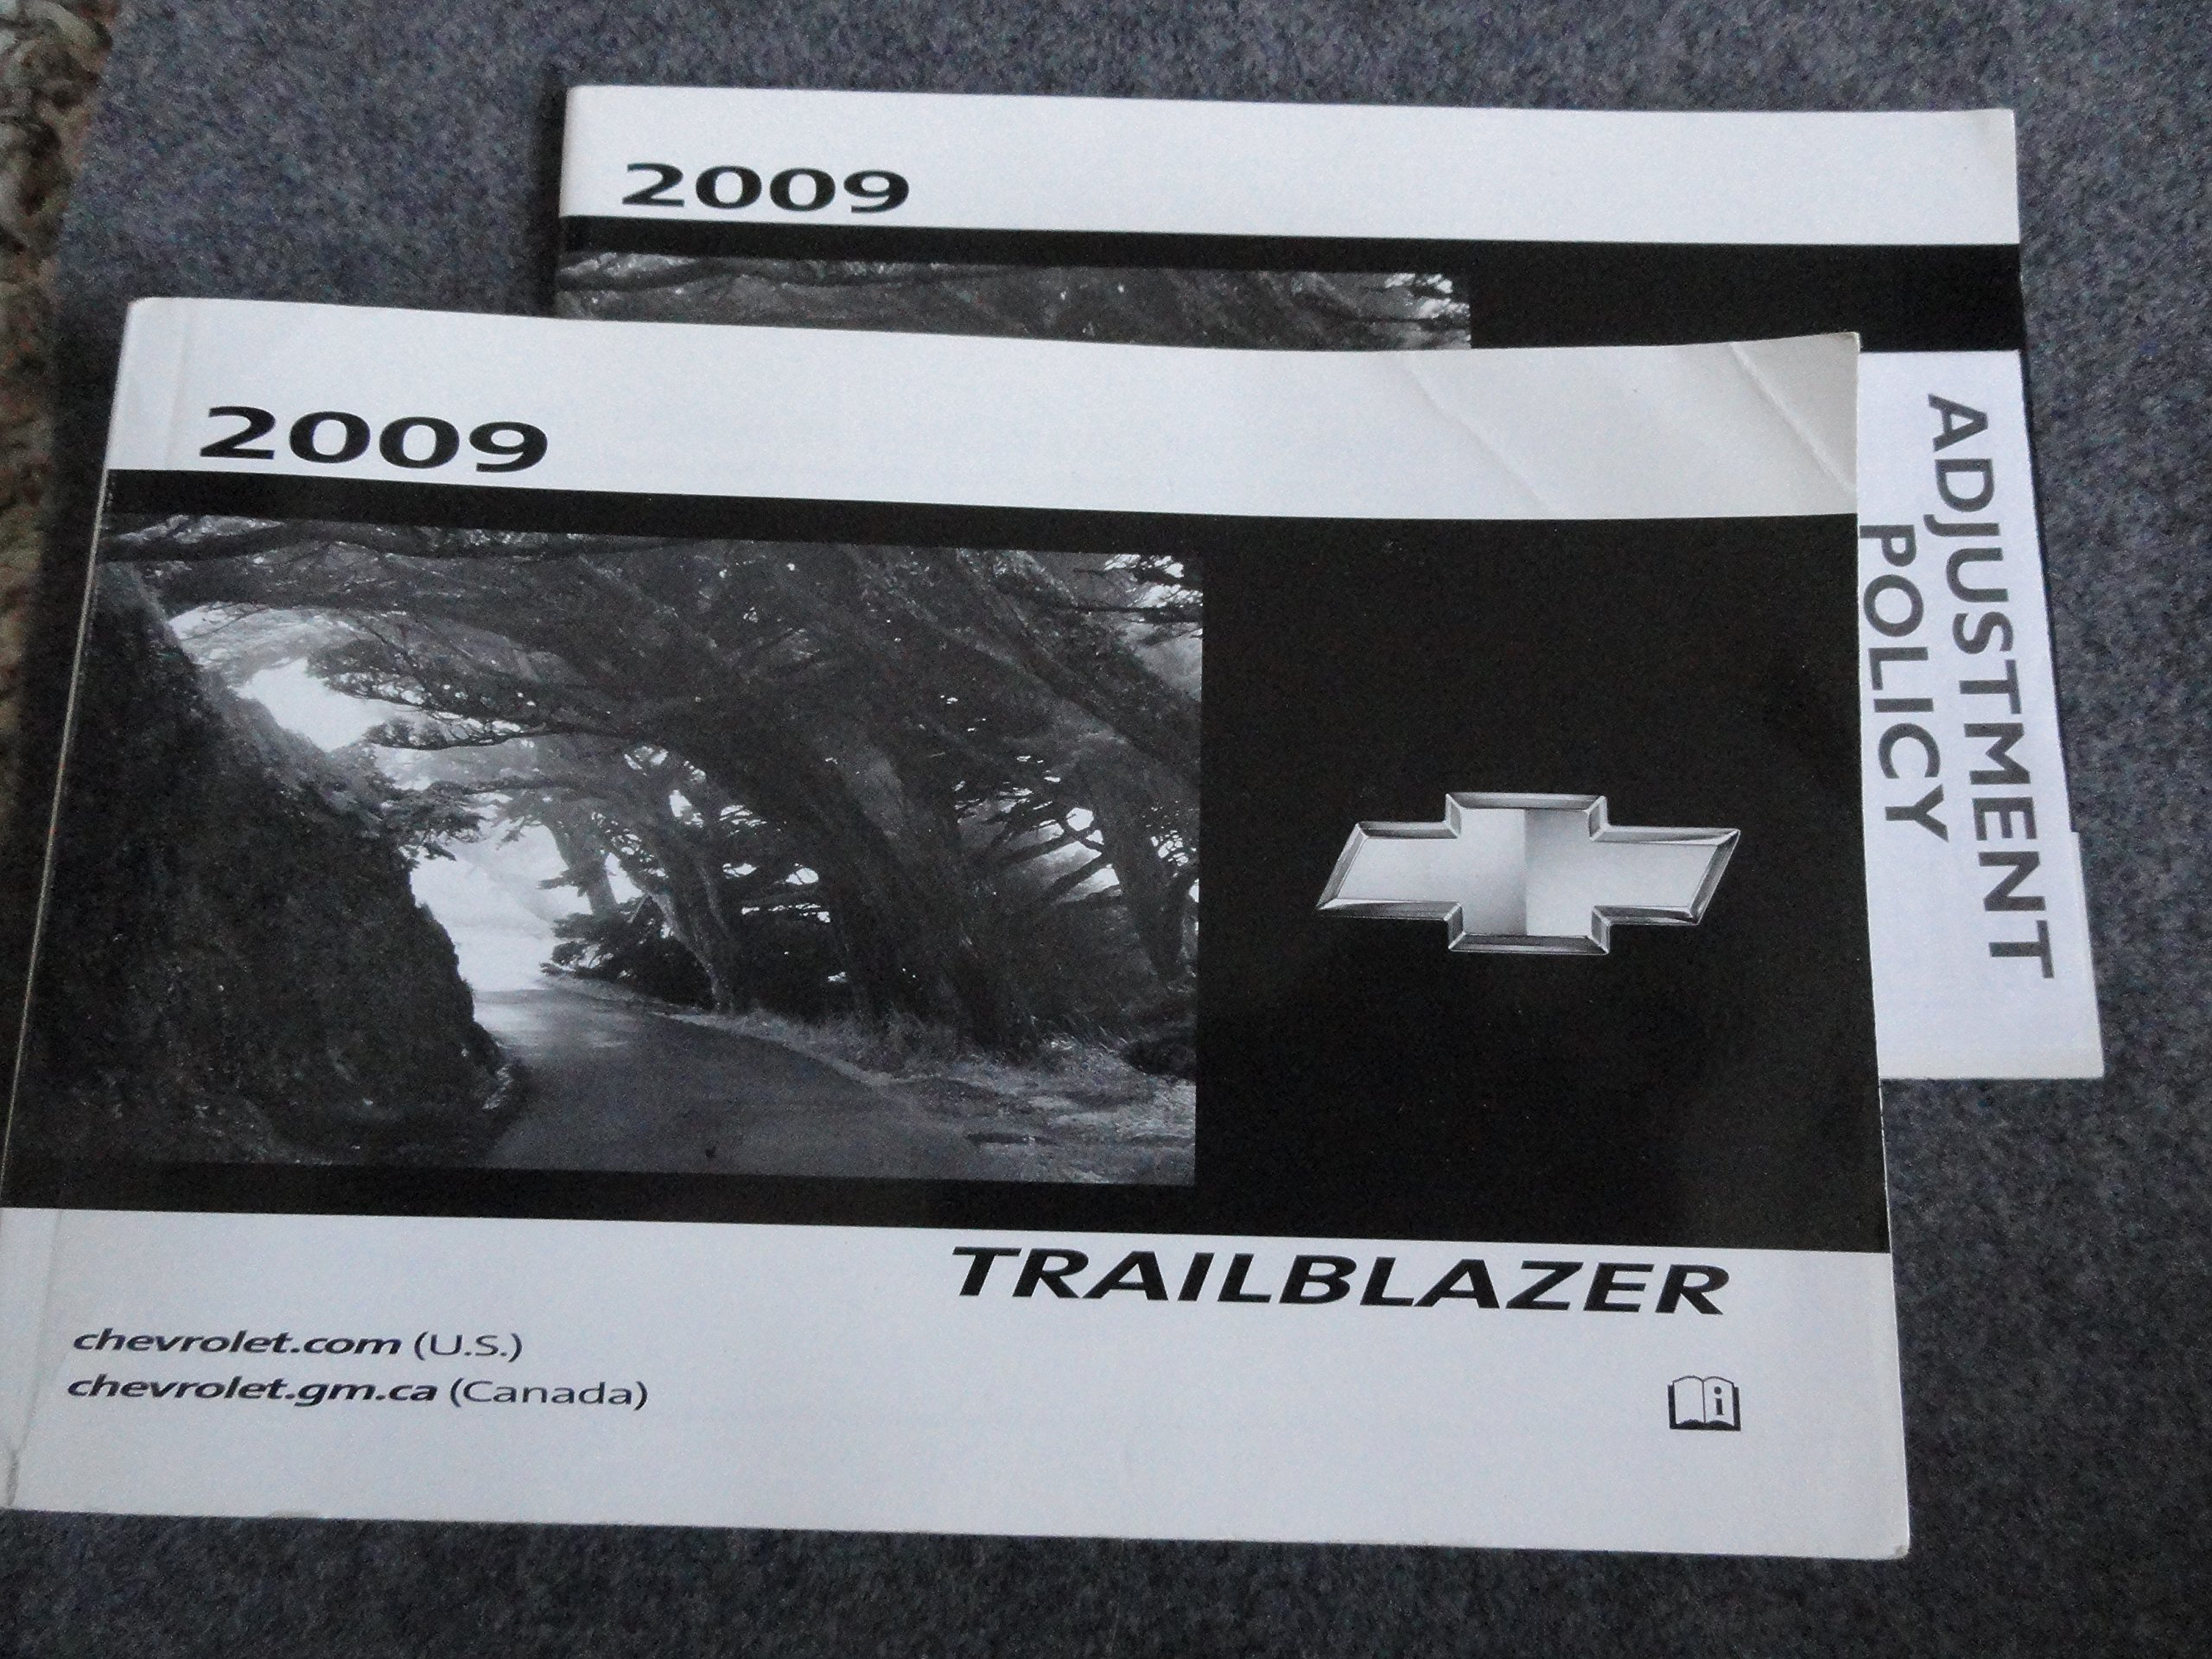 2009 chevy chevrolet trailblazer owners manual